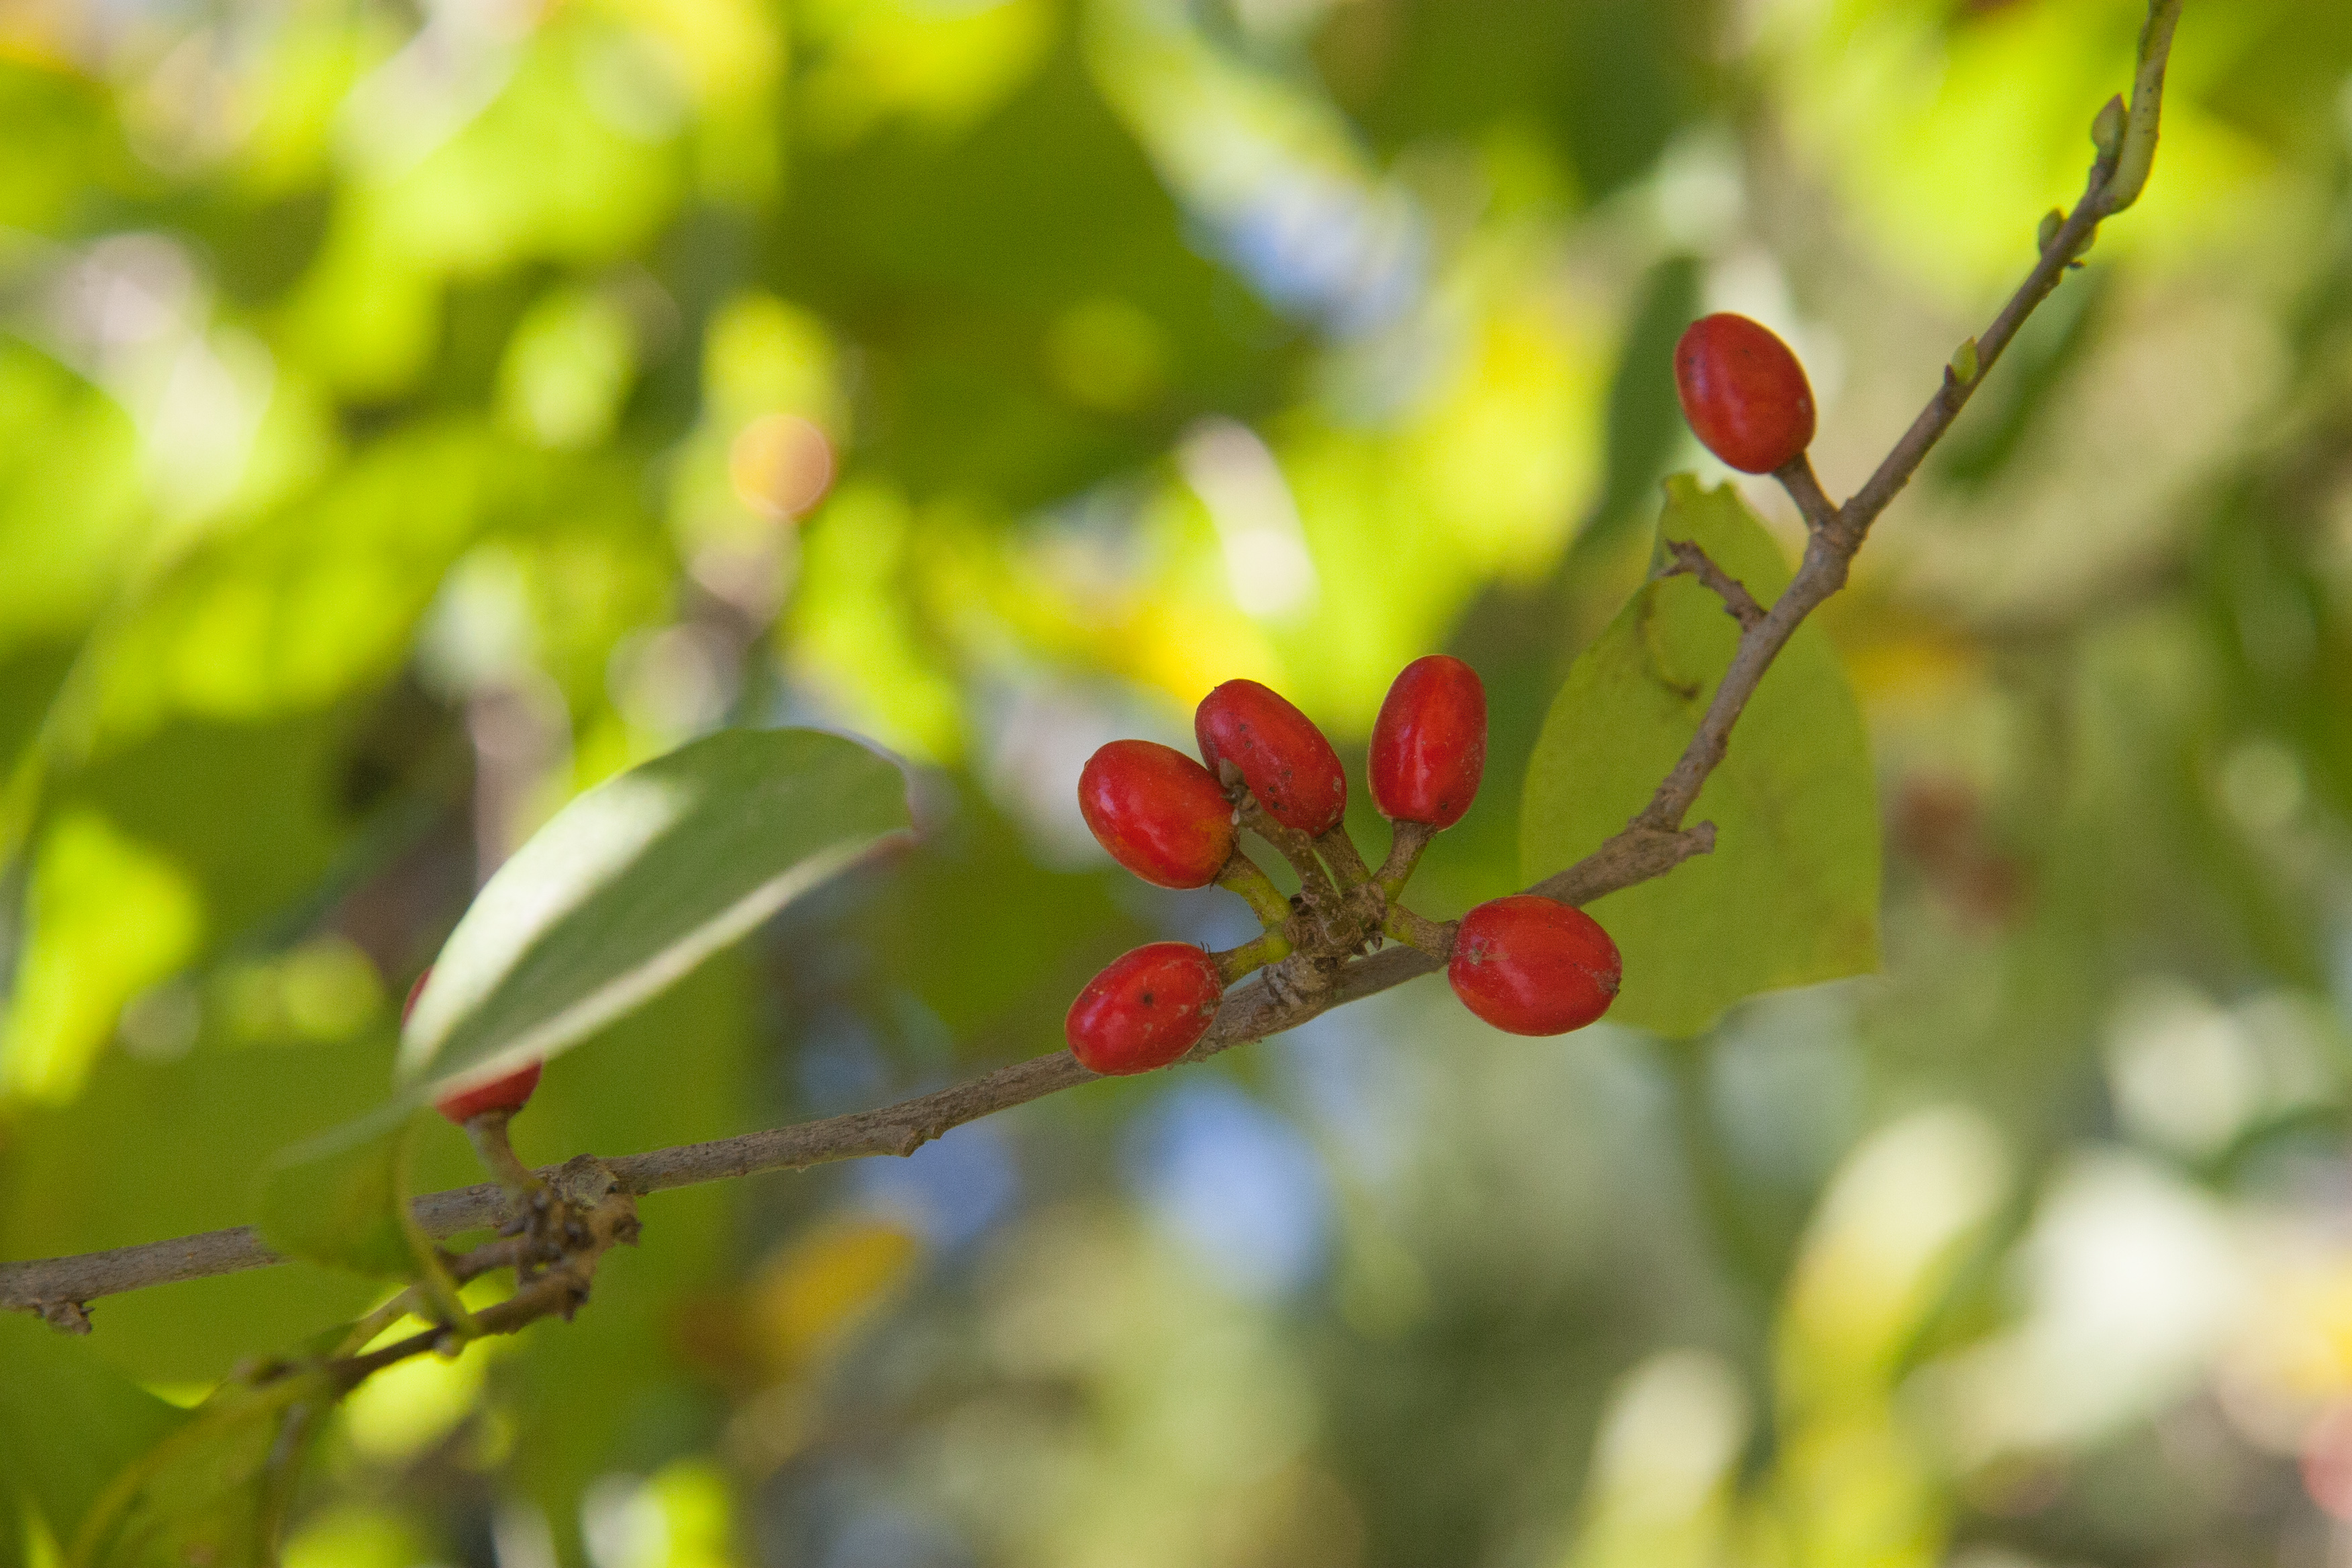 Spicebush Berries, aka Lindera Benzoin